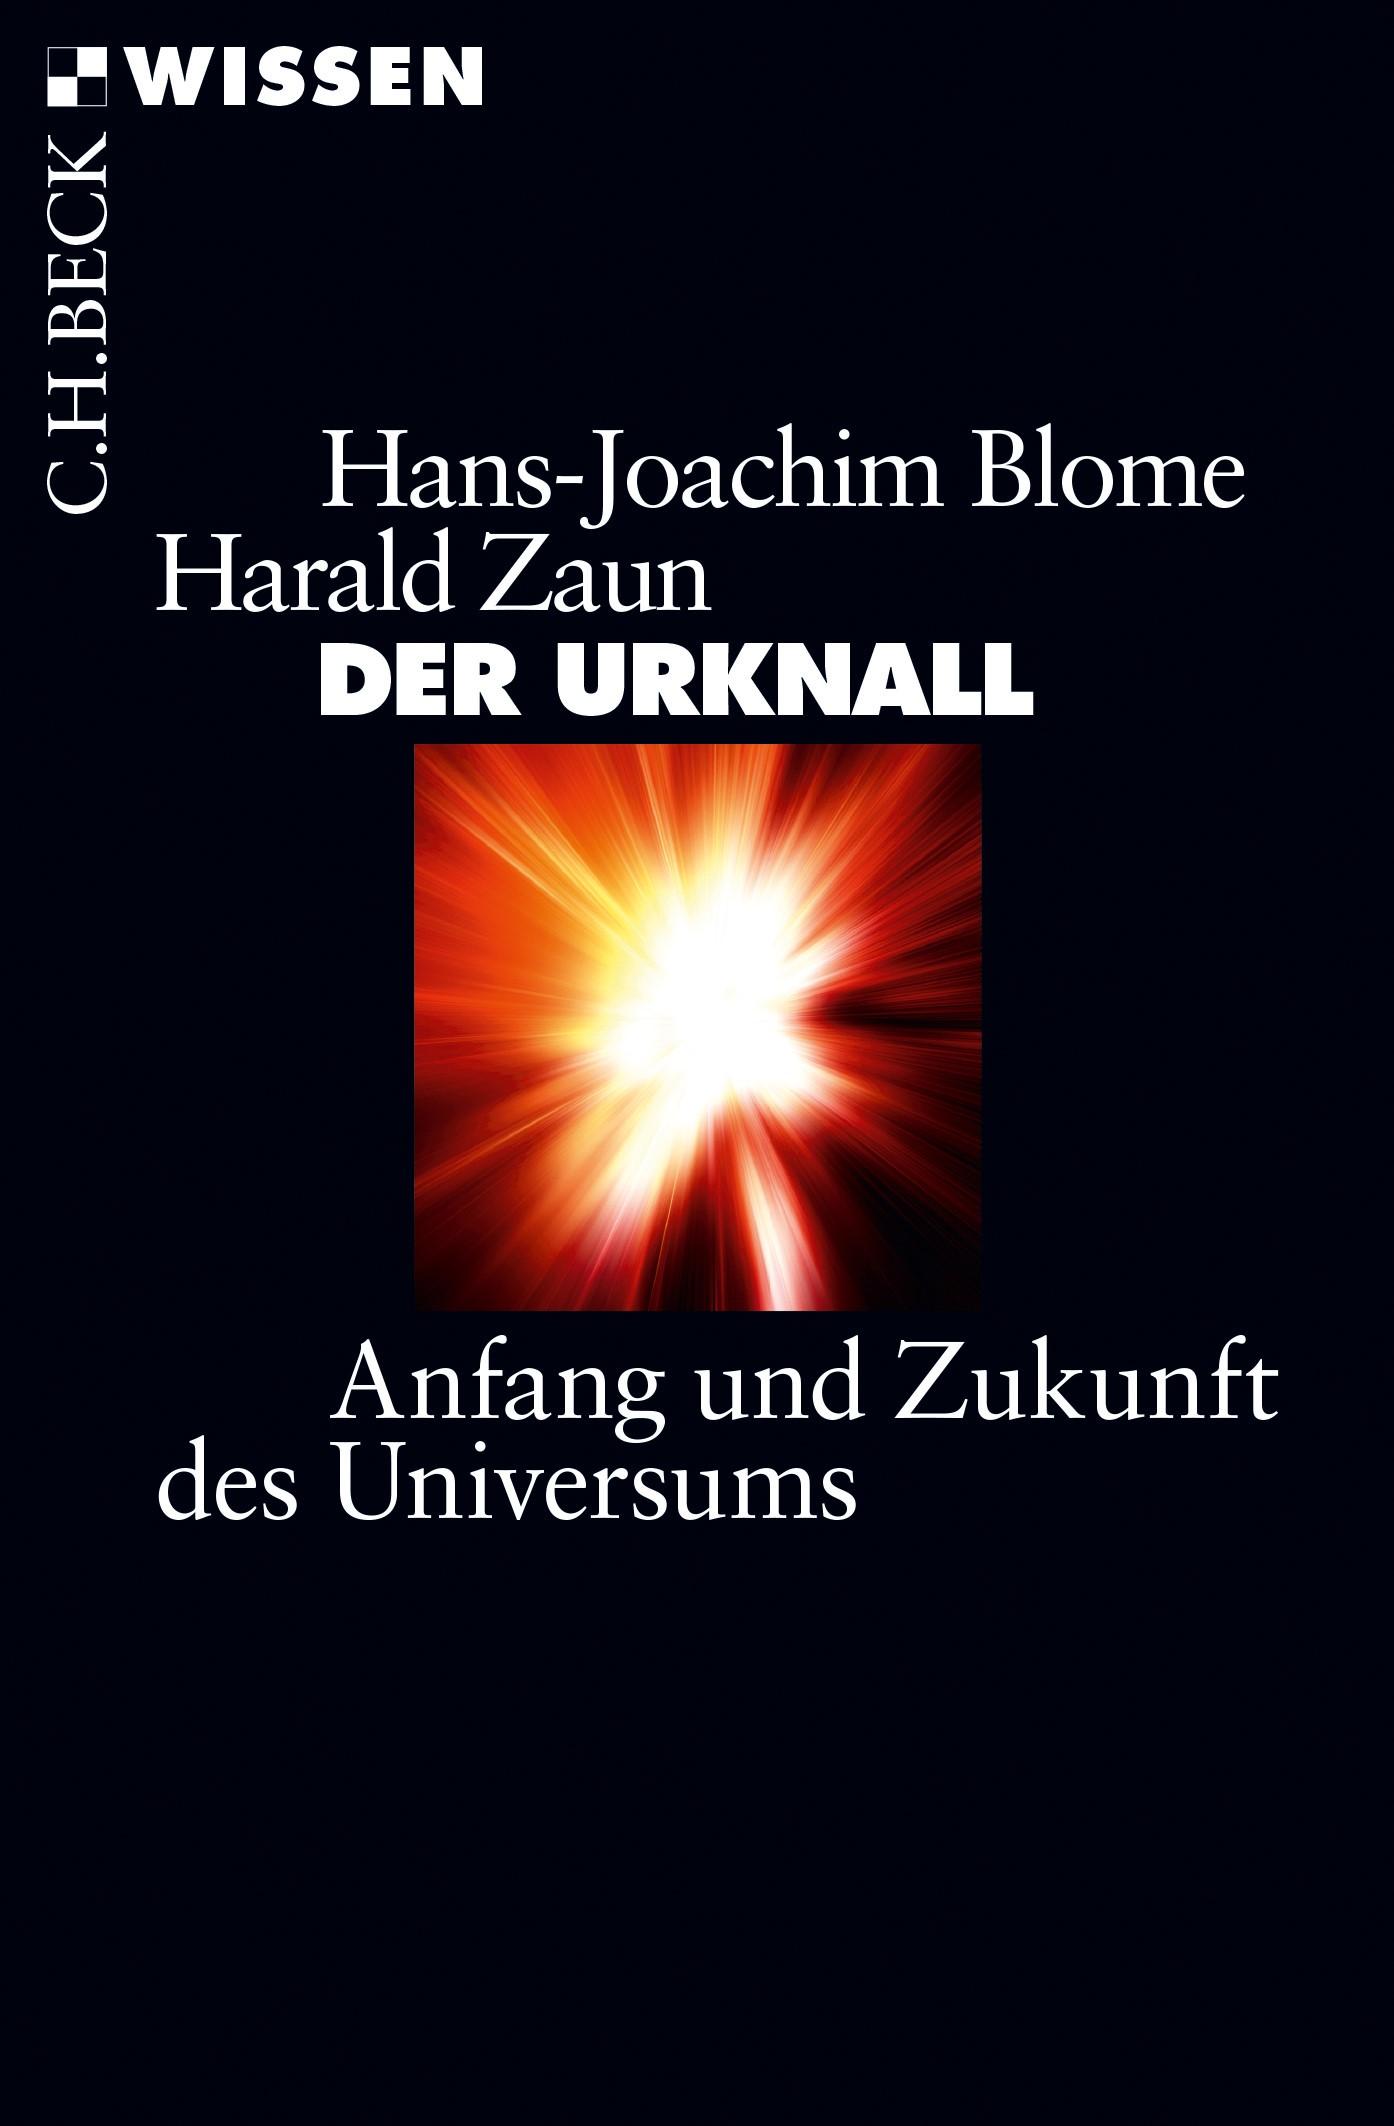 Der Urknall | Blome, Hans-Joachim / Zaun, Harald | 3., aktualisierte Auflage, 2015 | Buch (Cover)